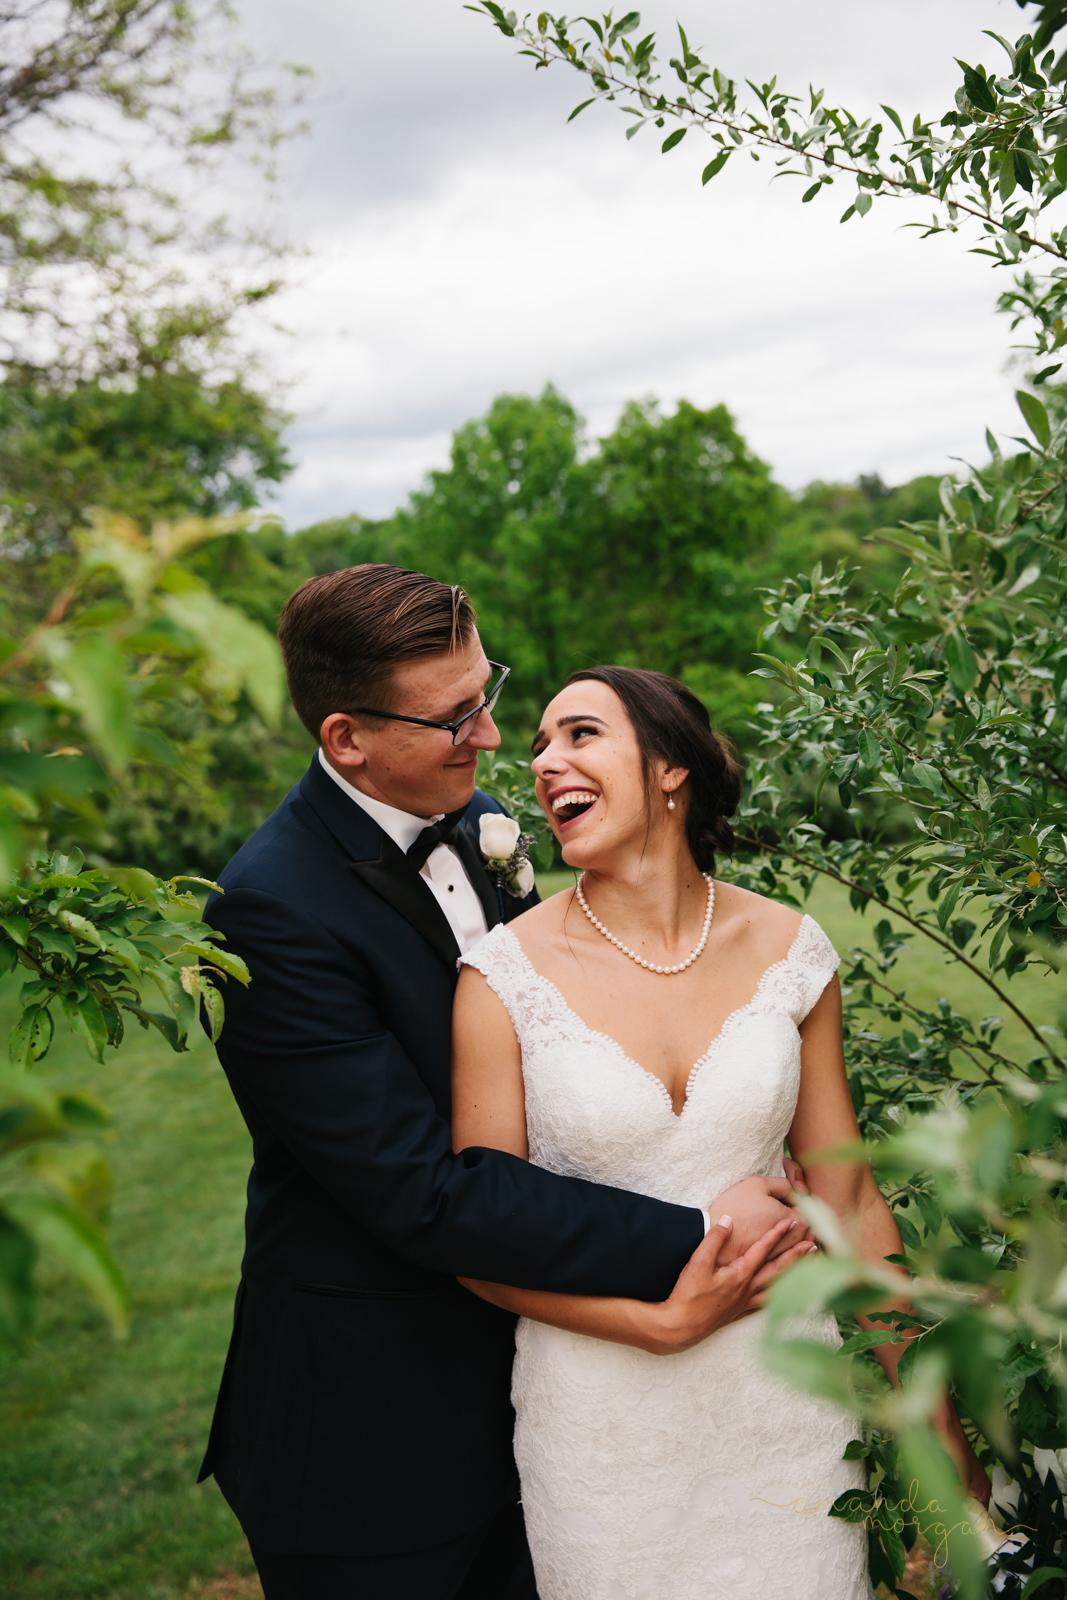 Publick-House-Wedding-Amanda-Morgan-25.jpg